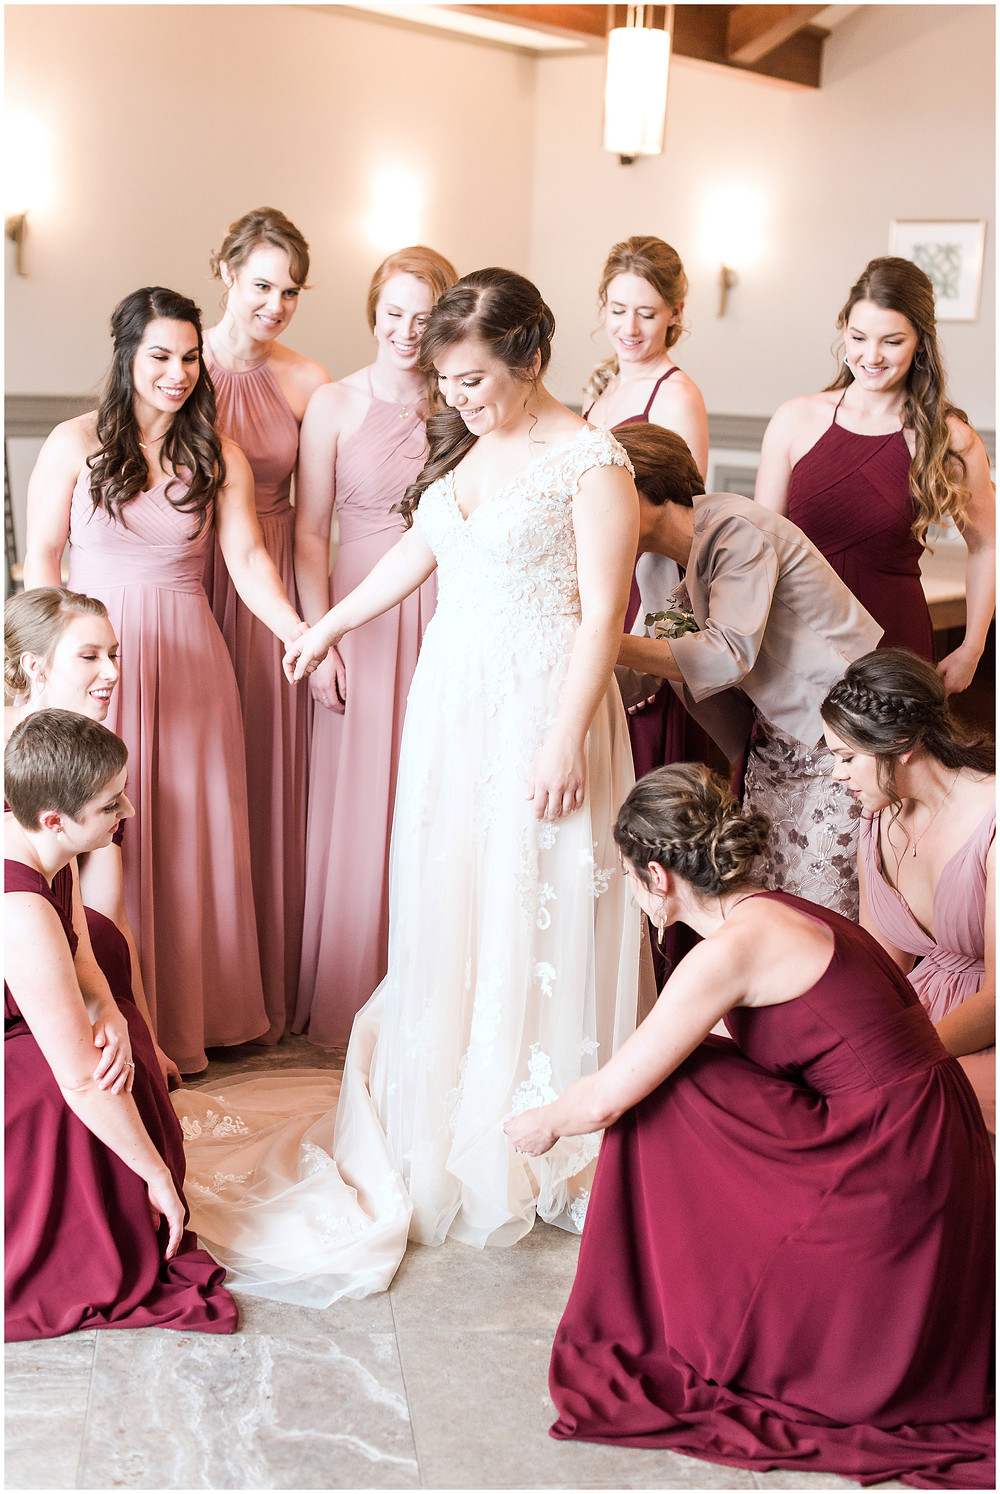 New Mexico wedding photographer. Albuquerque wedding photographer. Noahs event venue wedding. Pink and burgundy wedding. outdoor wedding portraits. bride and bridesmaids. bride getting ready